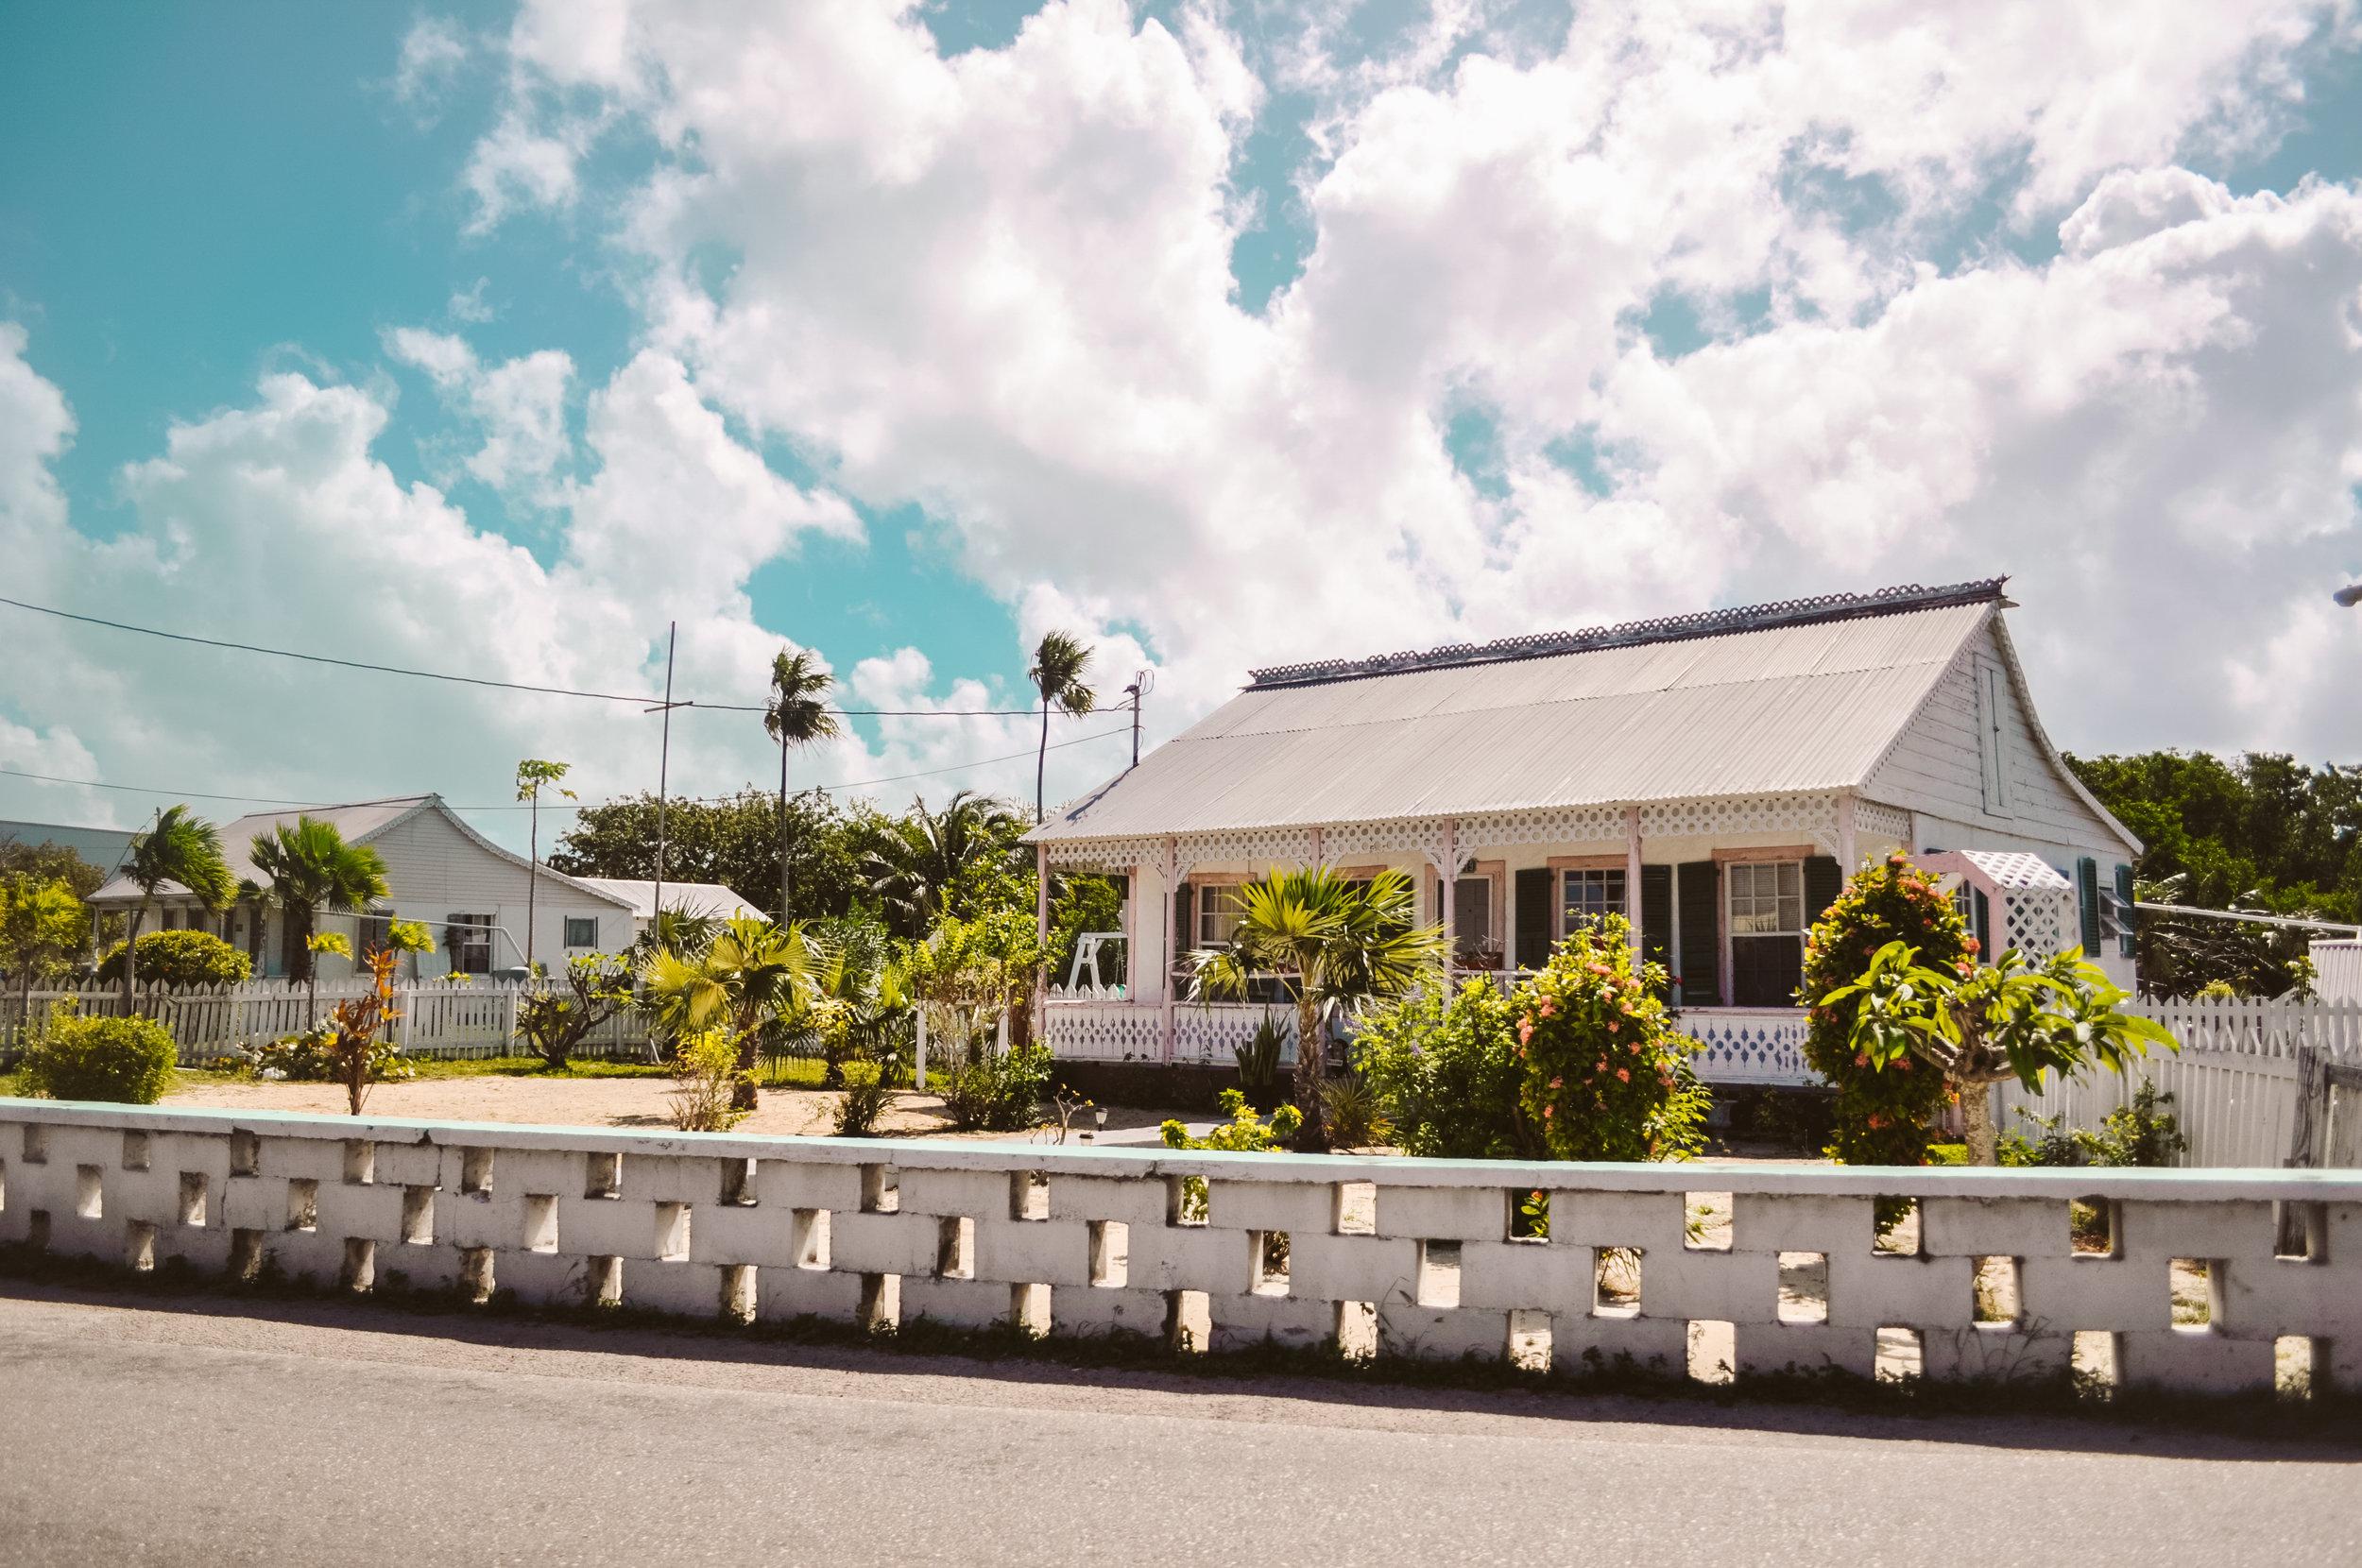 Cayman-01-15.jpg